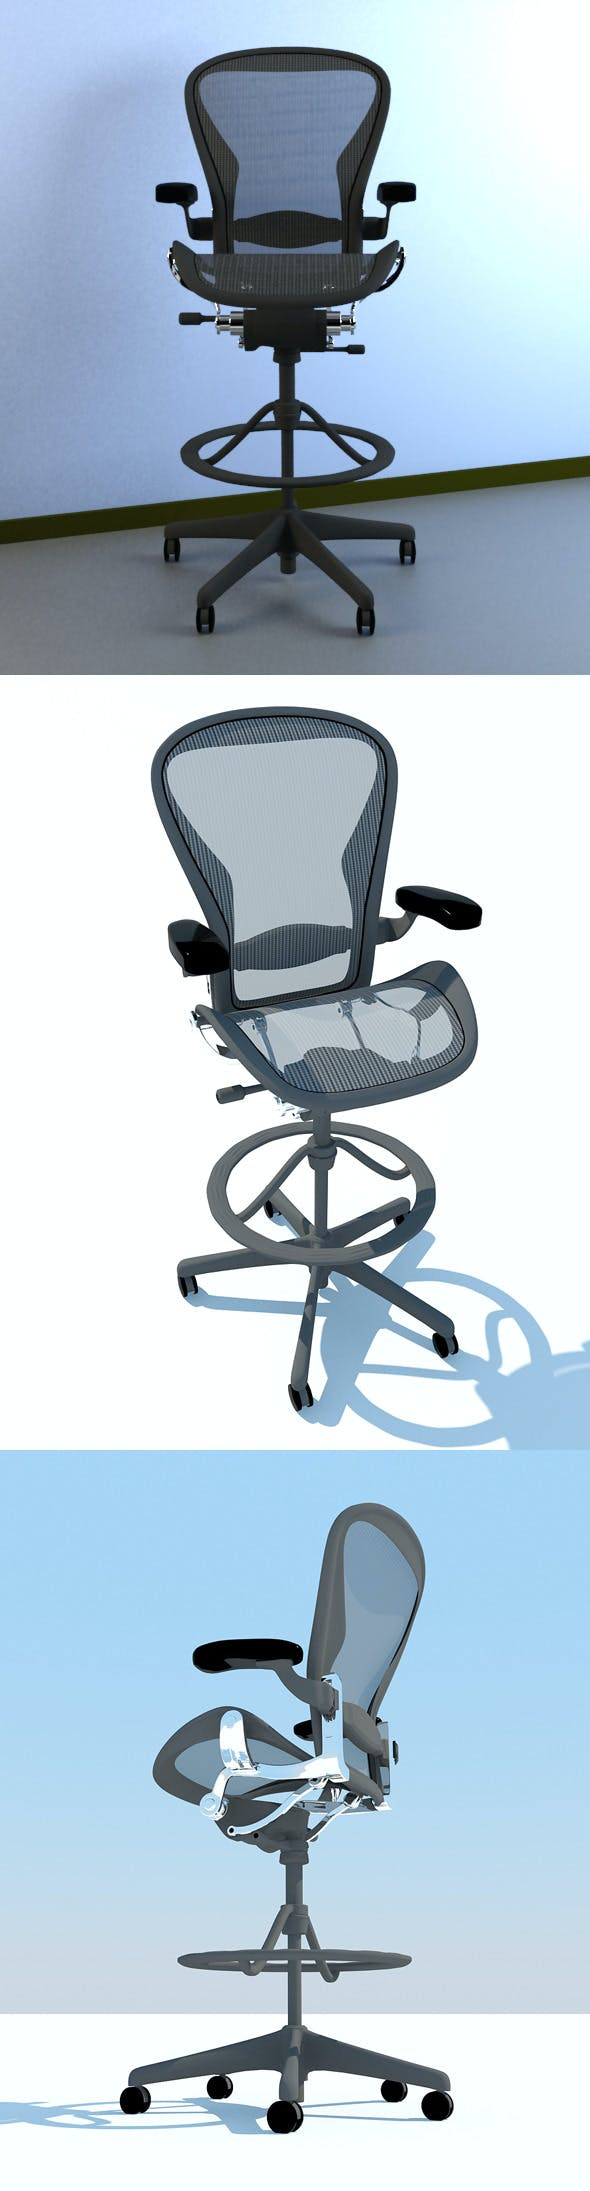 Aeron Work Stool Chair Herman Miller MAX 2011 - 3DOcean Item for Sale